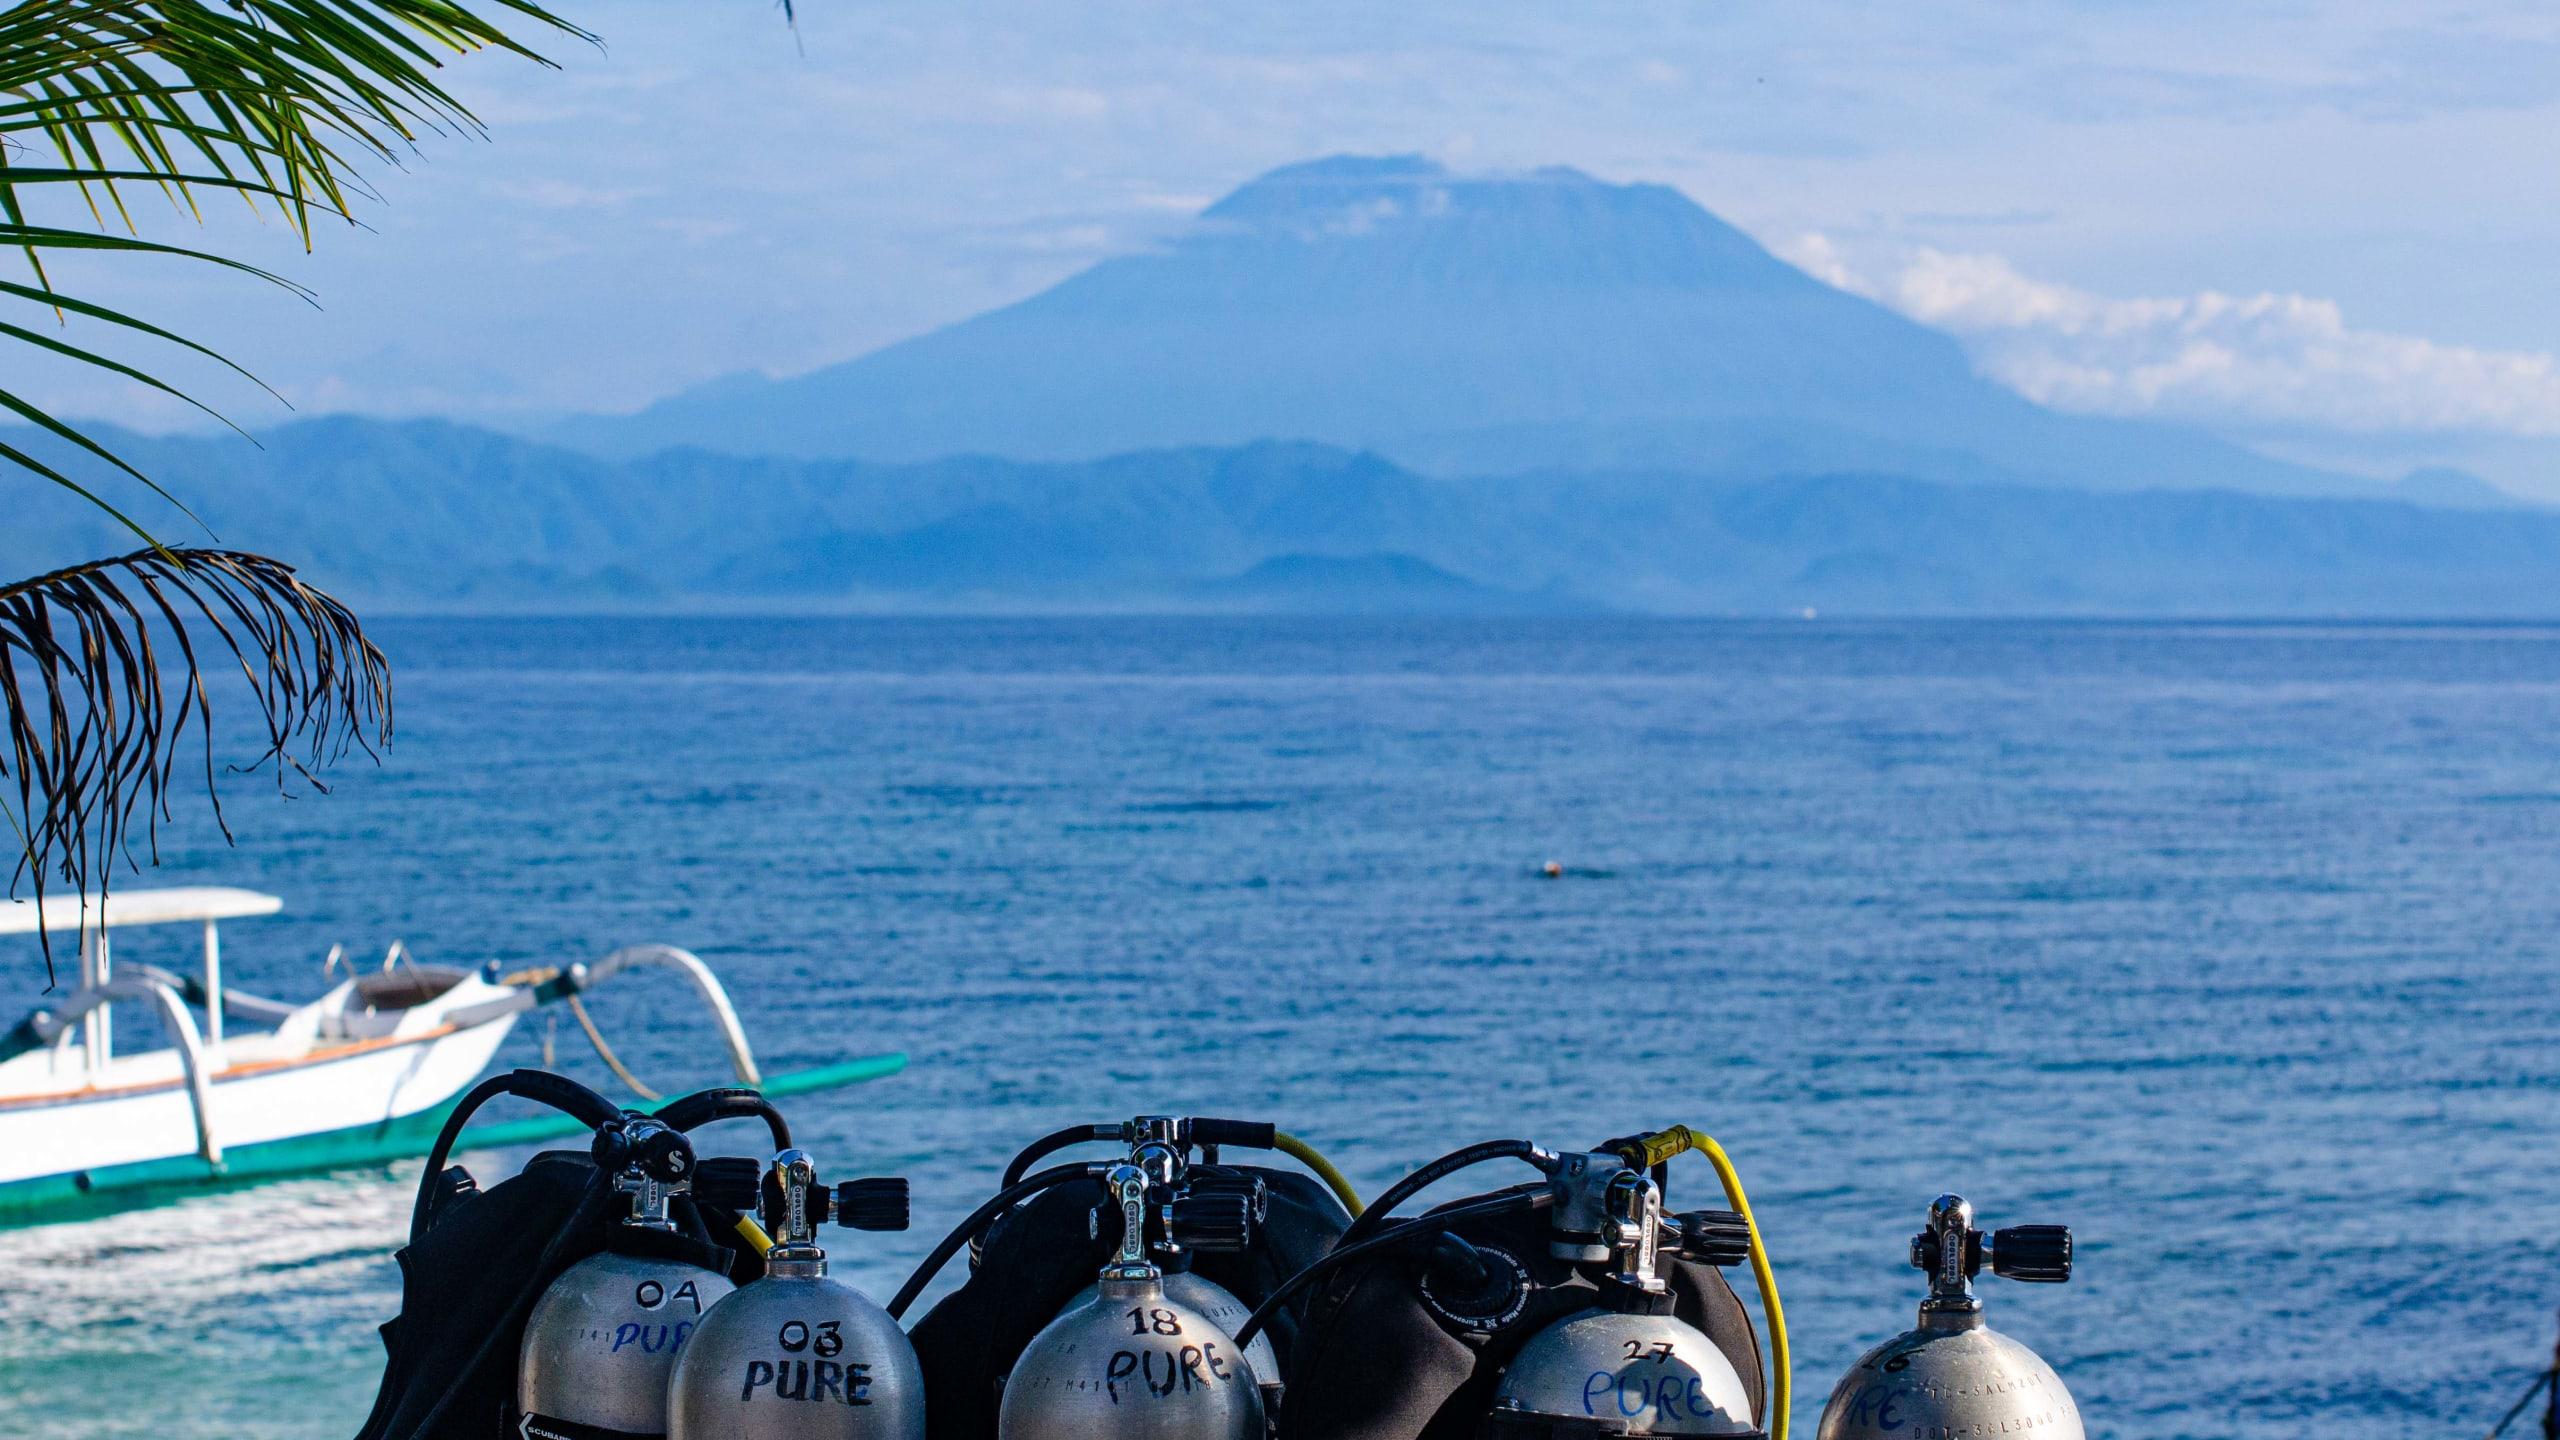 Morning preparation for Penida diving